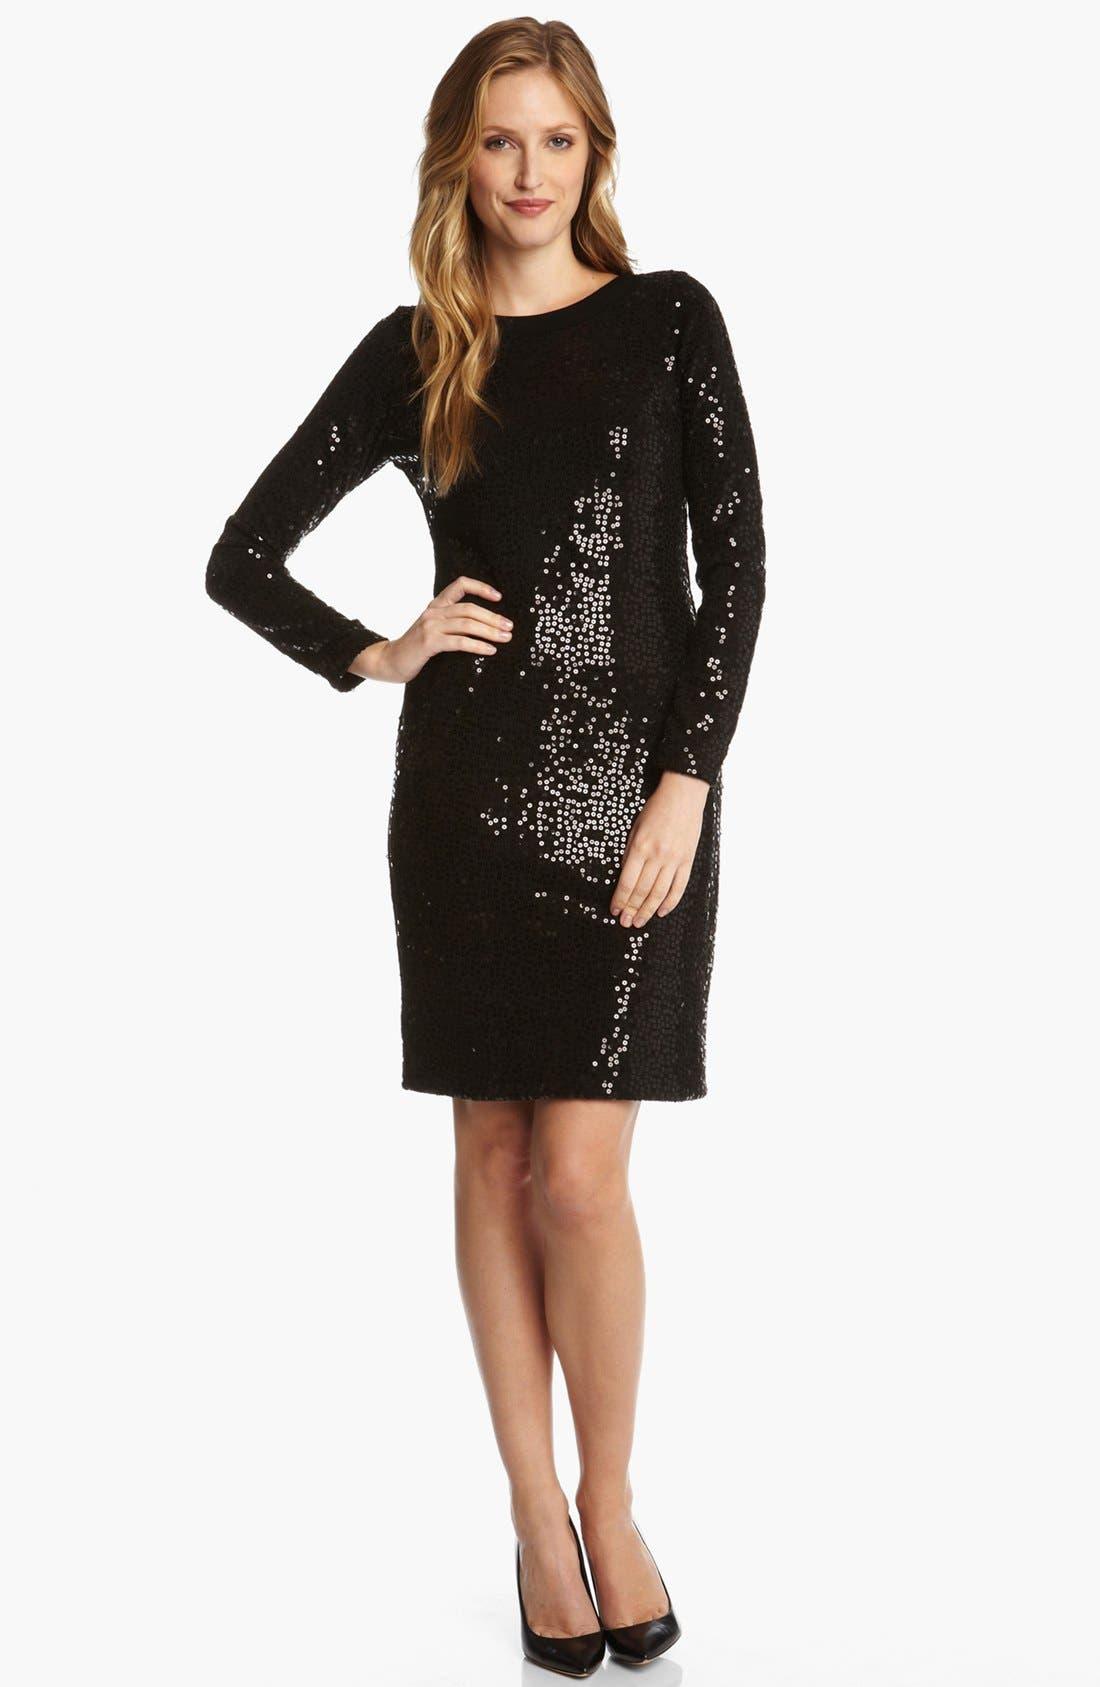 Alternate Image 1 Selected - Karen Kane Sequin Sweater Dress